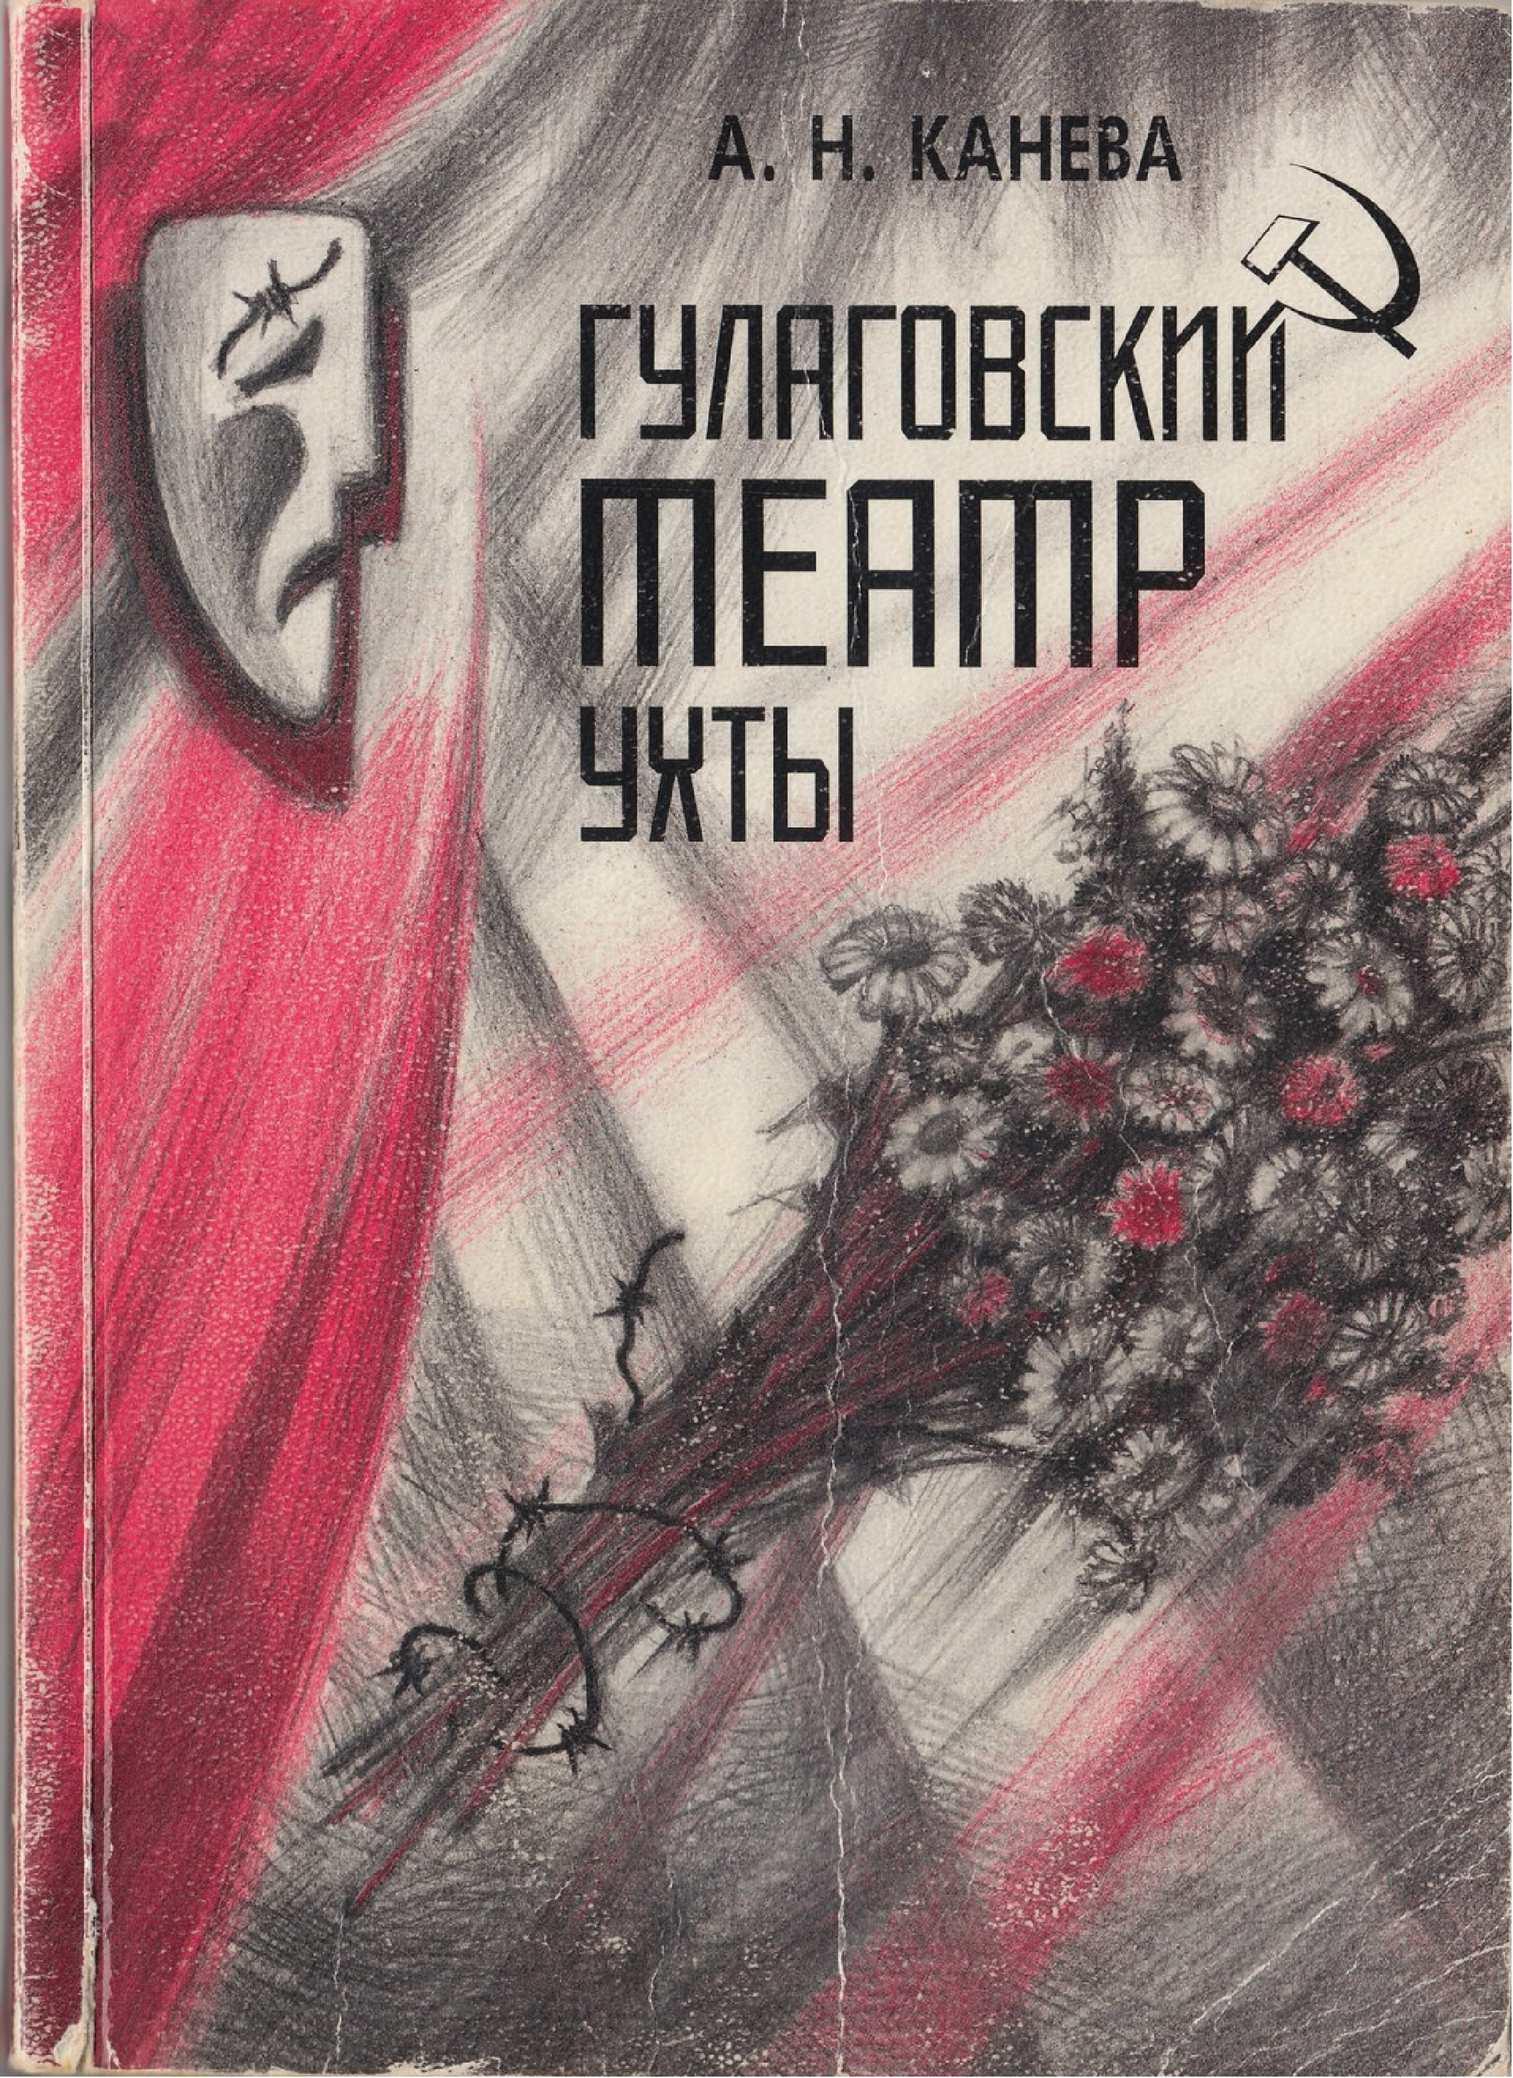 Гулаговский театр Ухты